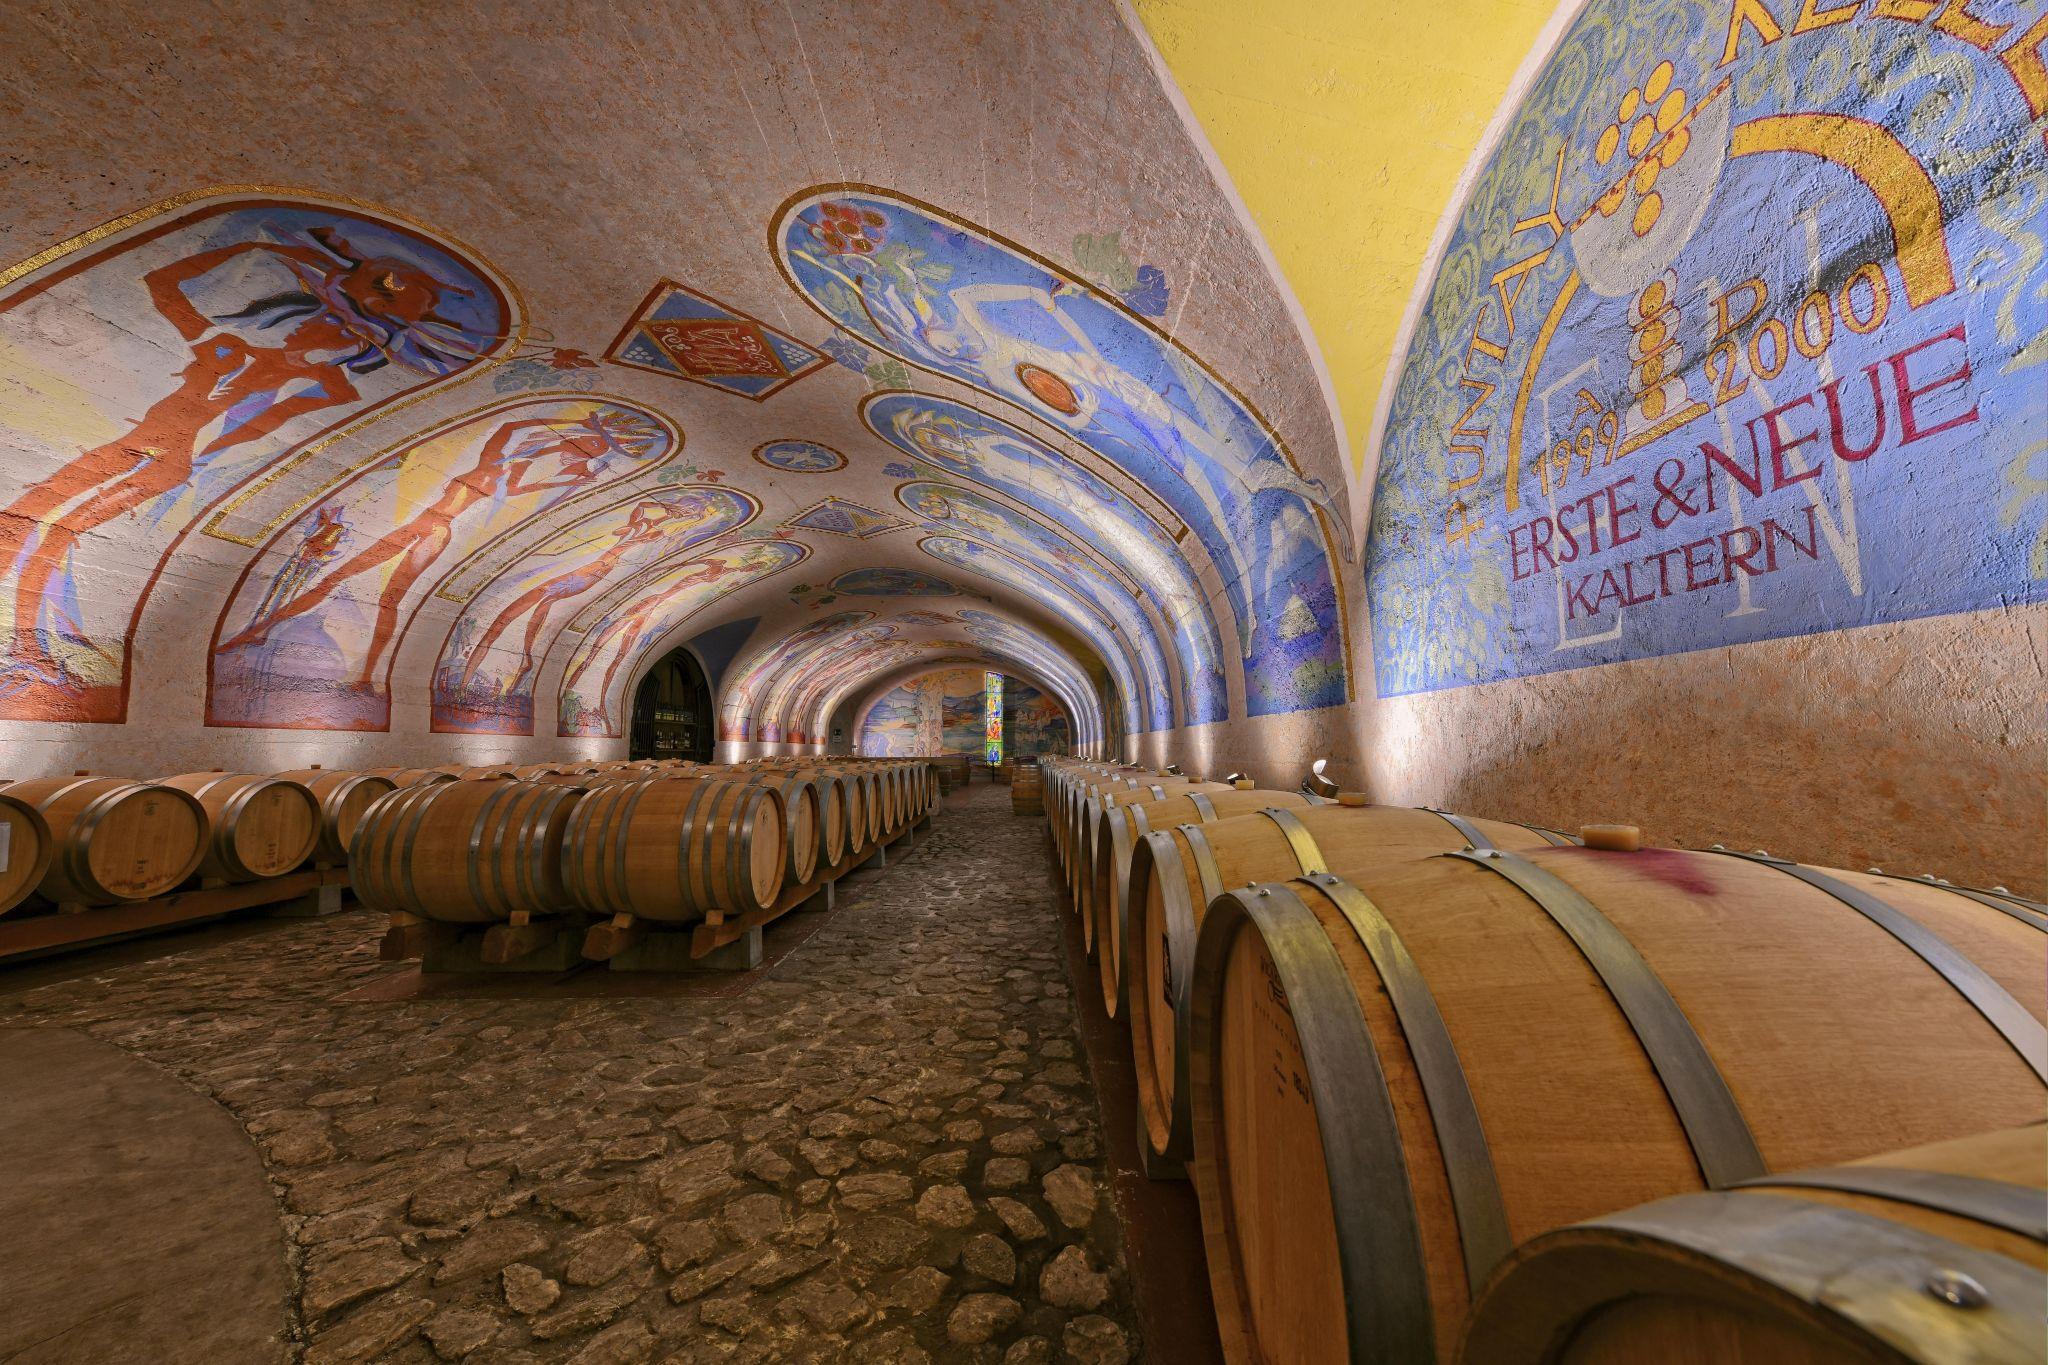 Puntay wine cellar, Italy